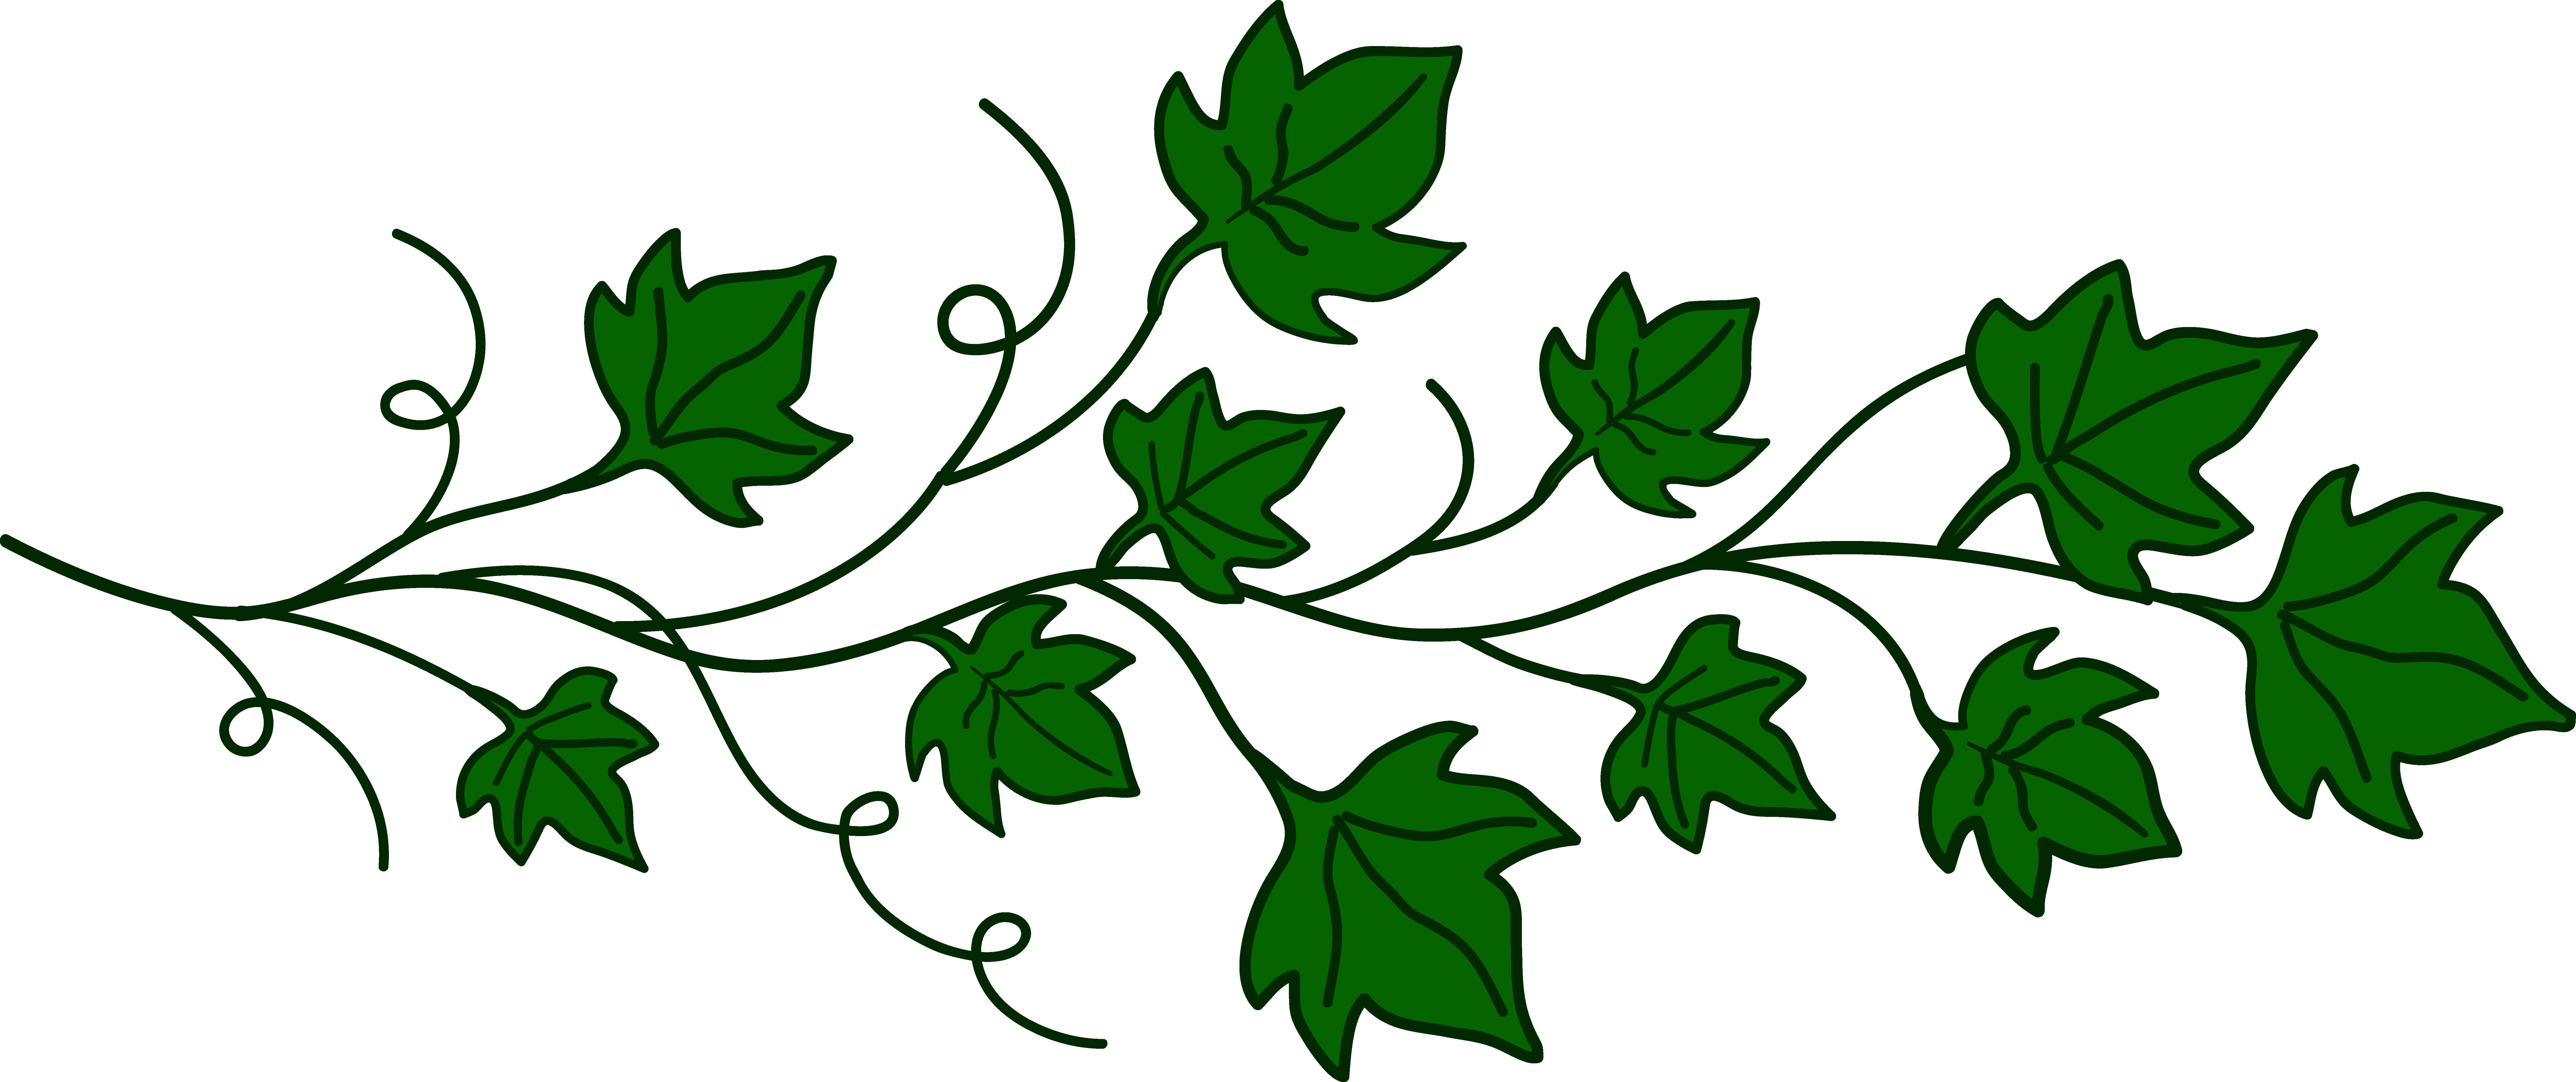 Vine of ivy leaves free clip art